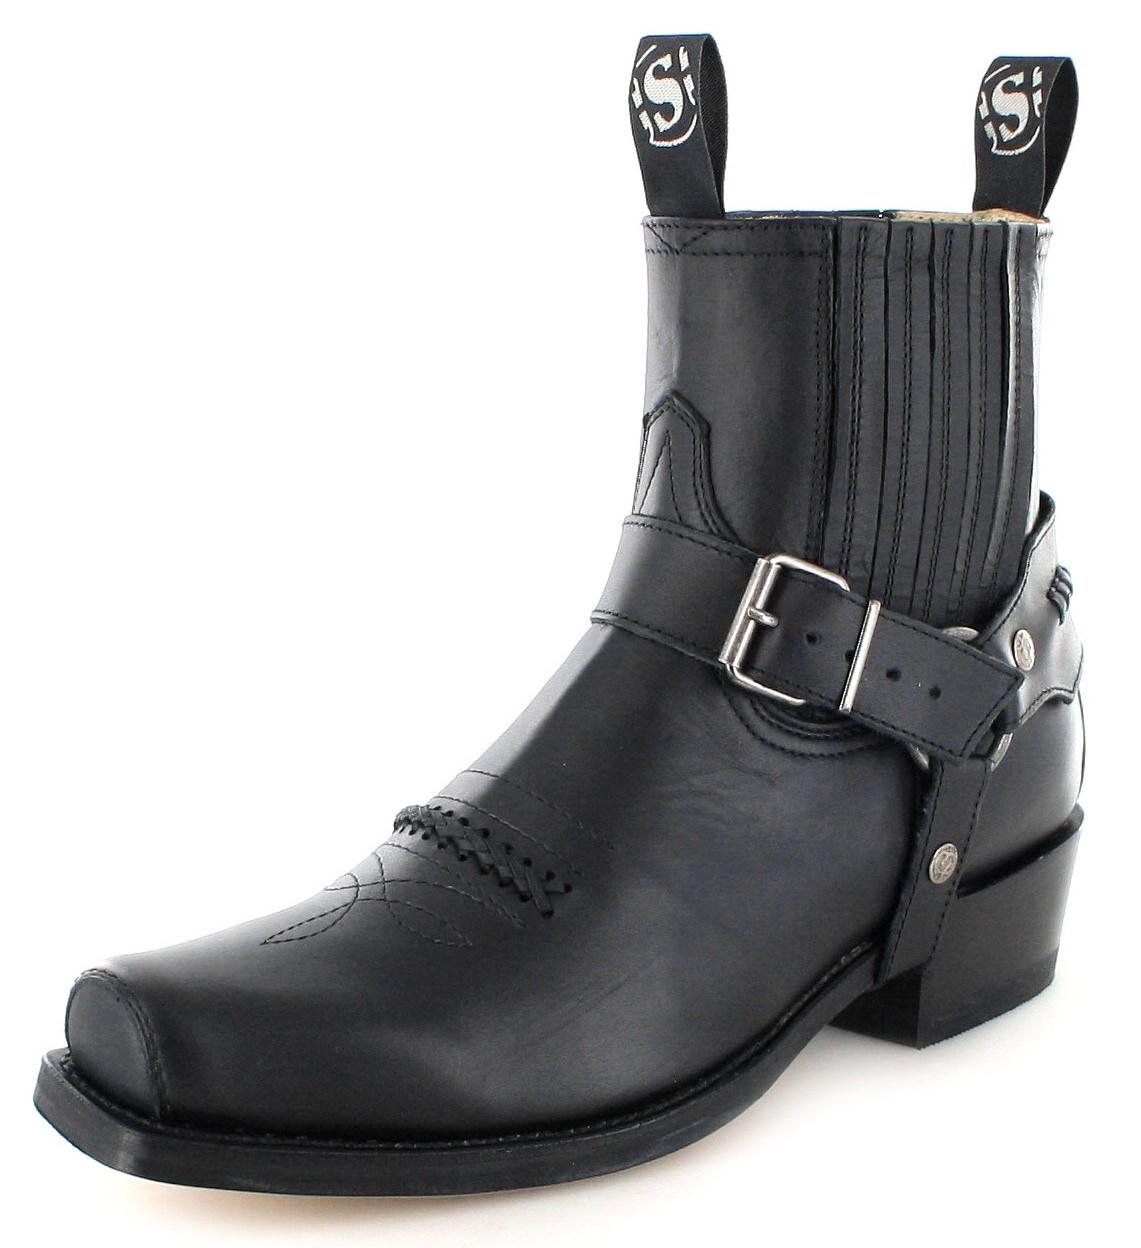 Sendra Boots 6445 Negro biker ankle boot - Black